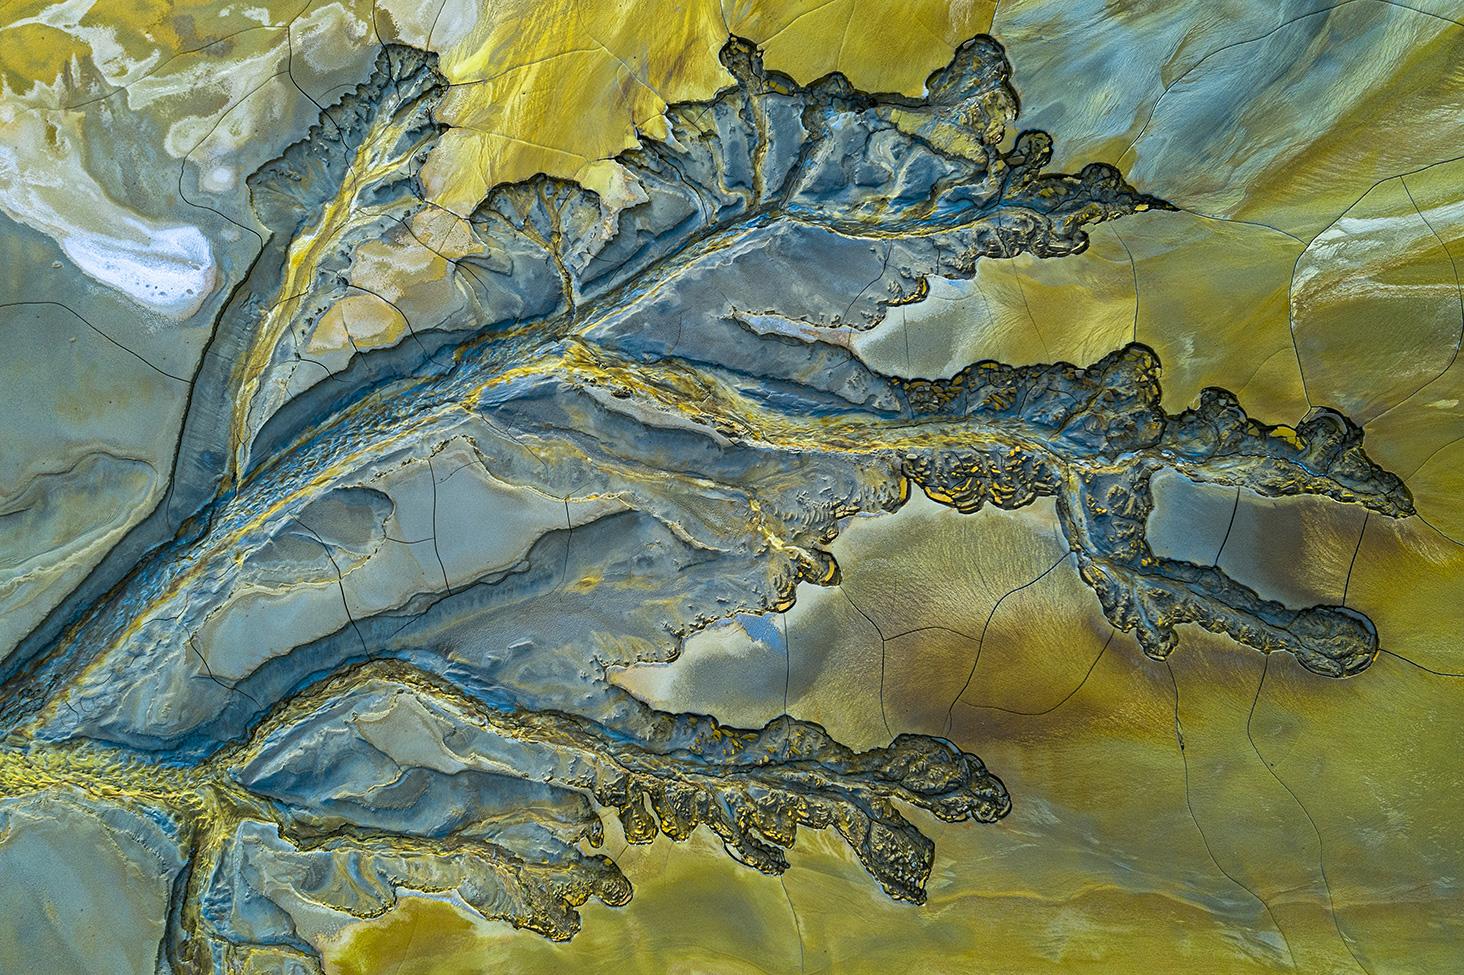 Mineralized Erosion - Ignacio Medem - Portfolio Natural, Fotografía de Naturaleza de Autor